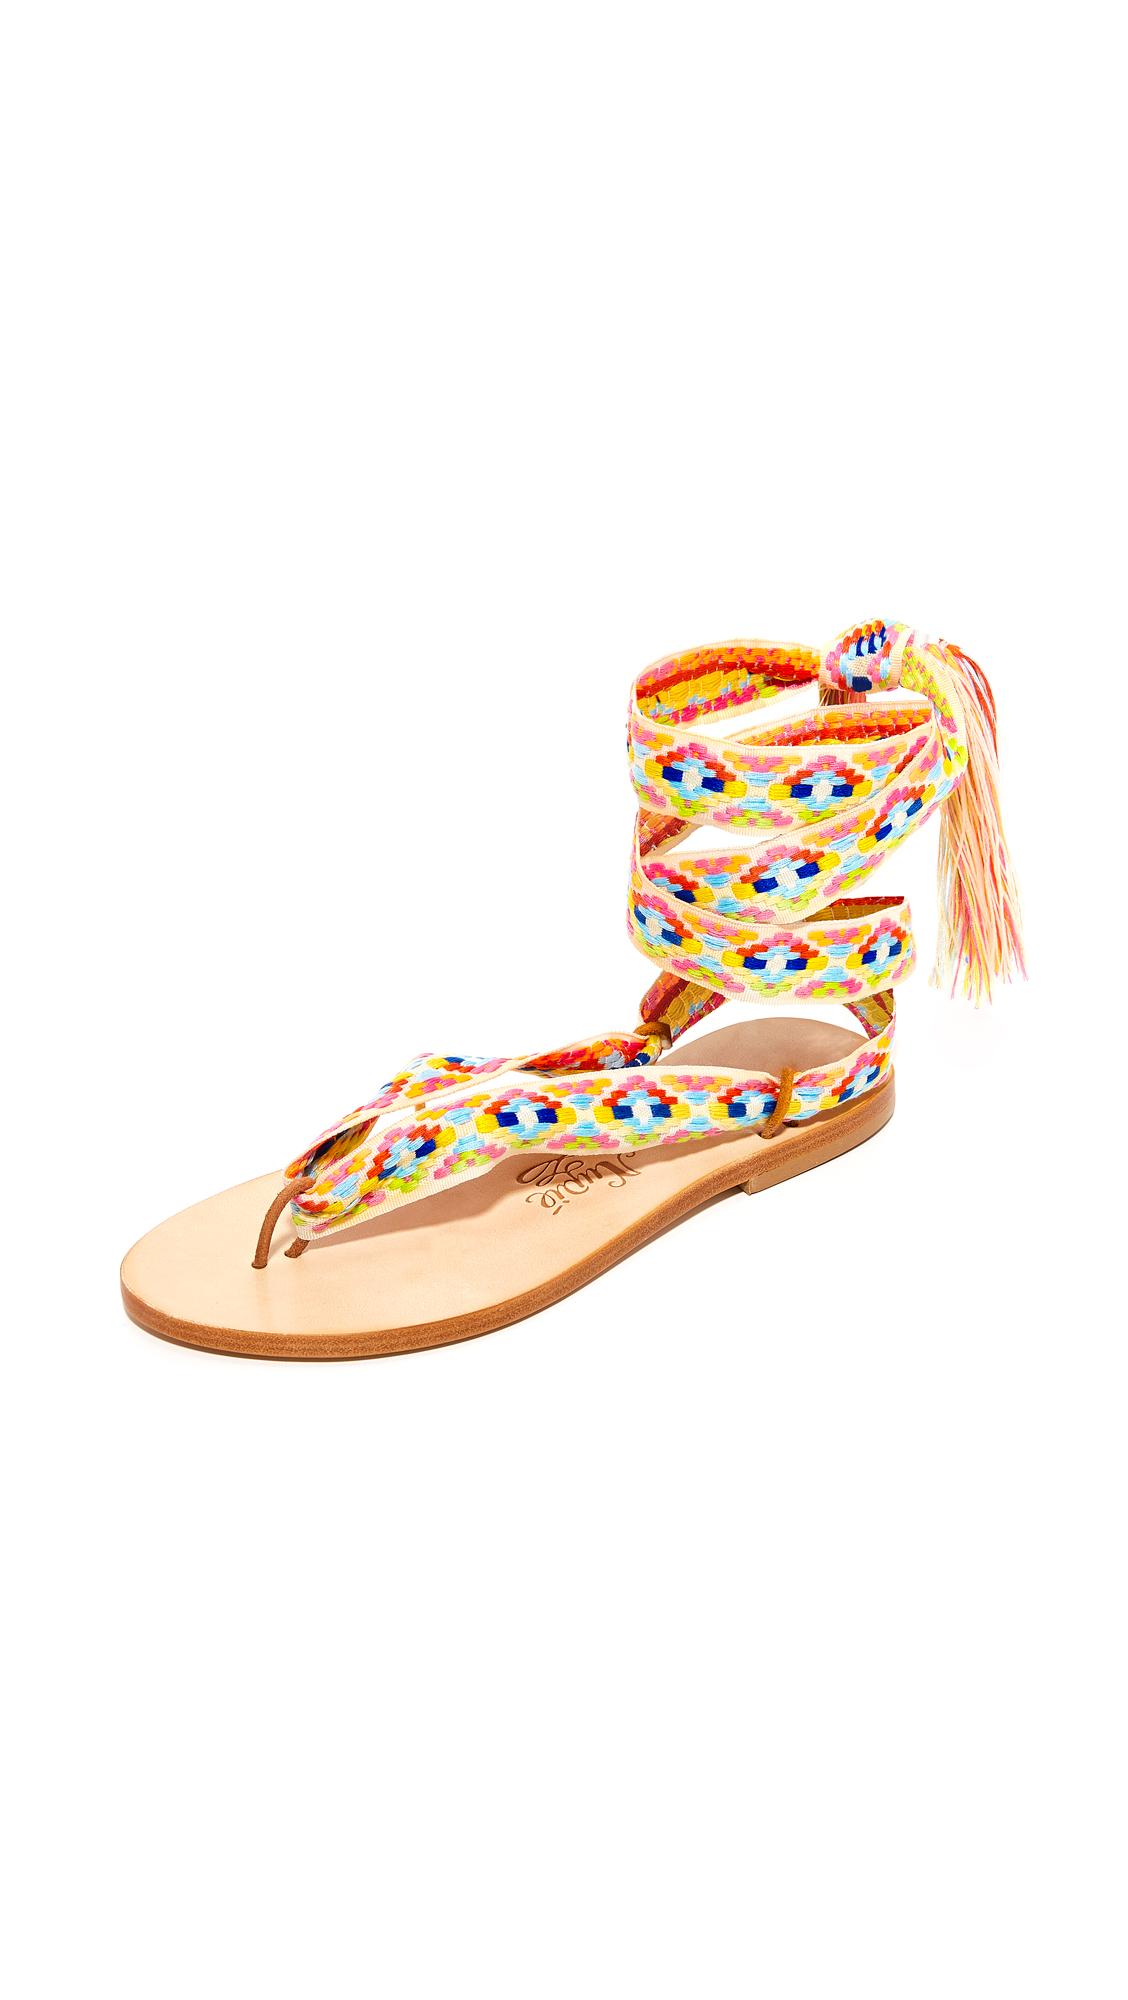 Nupie Nupie Wrap Sandals - Greece/Natural